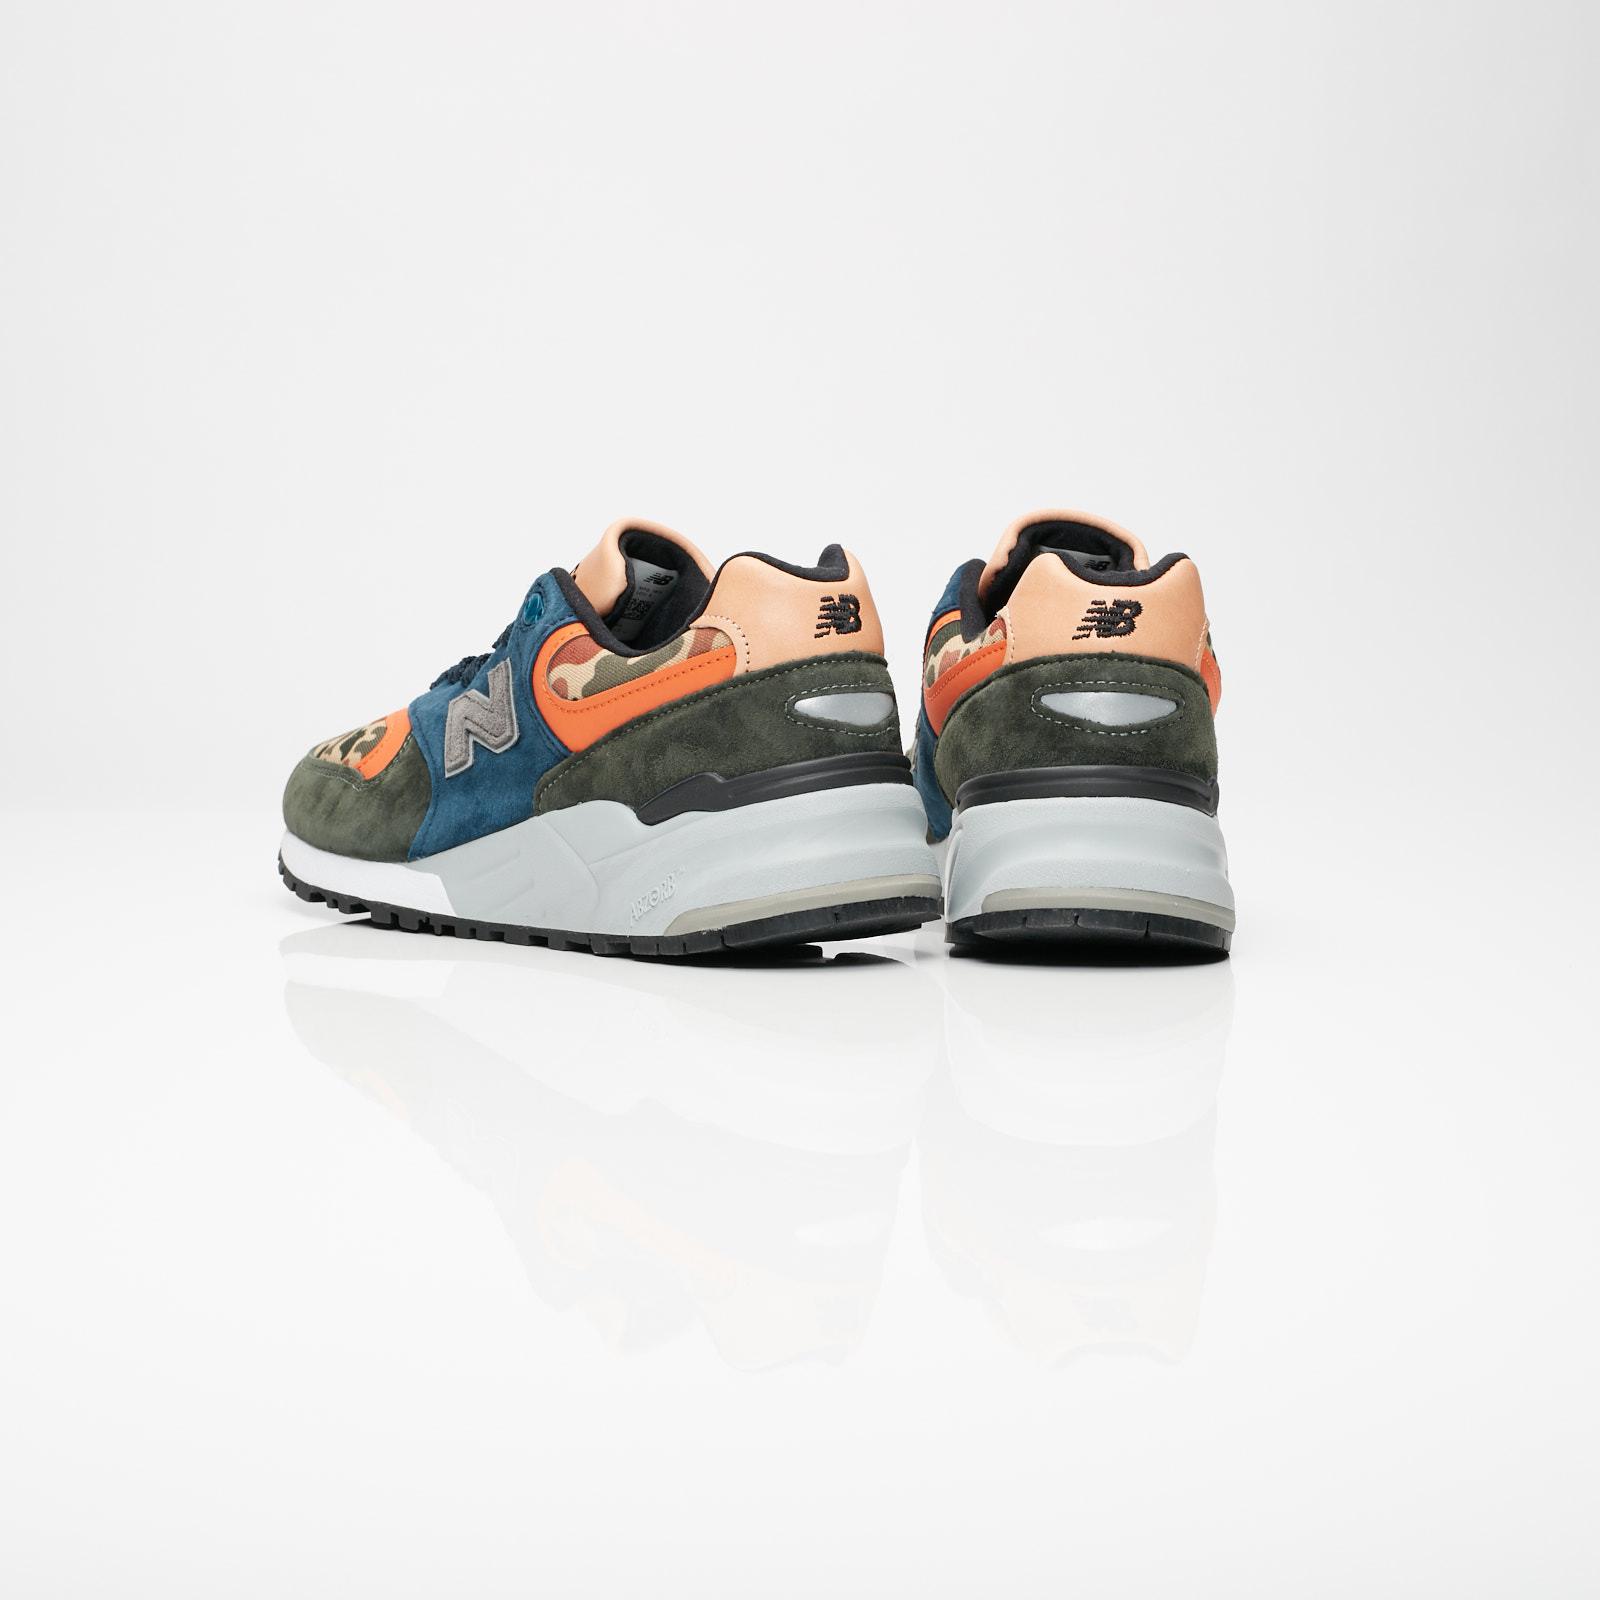 New Balance M999 - M999ni - SNS | sneakers & streetwear online ...